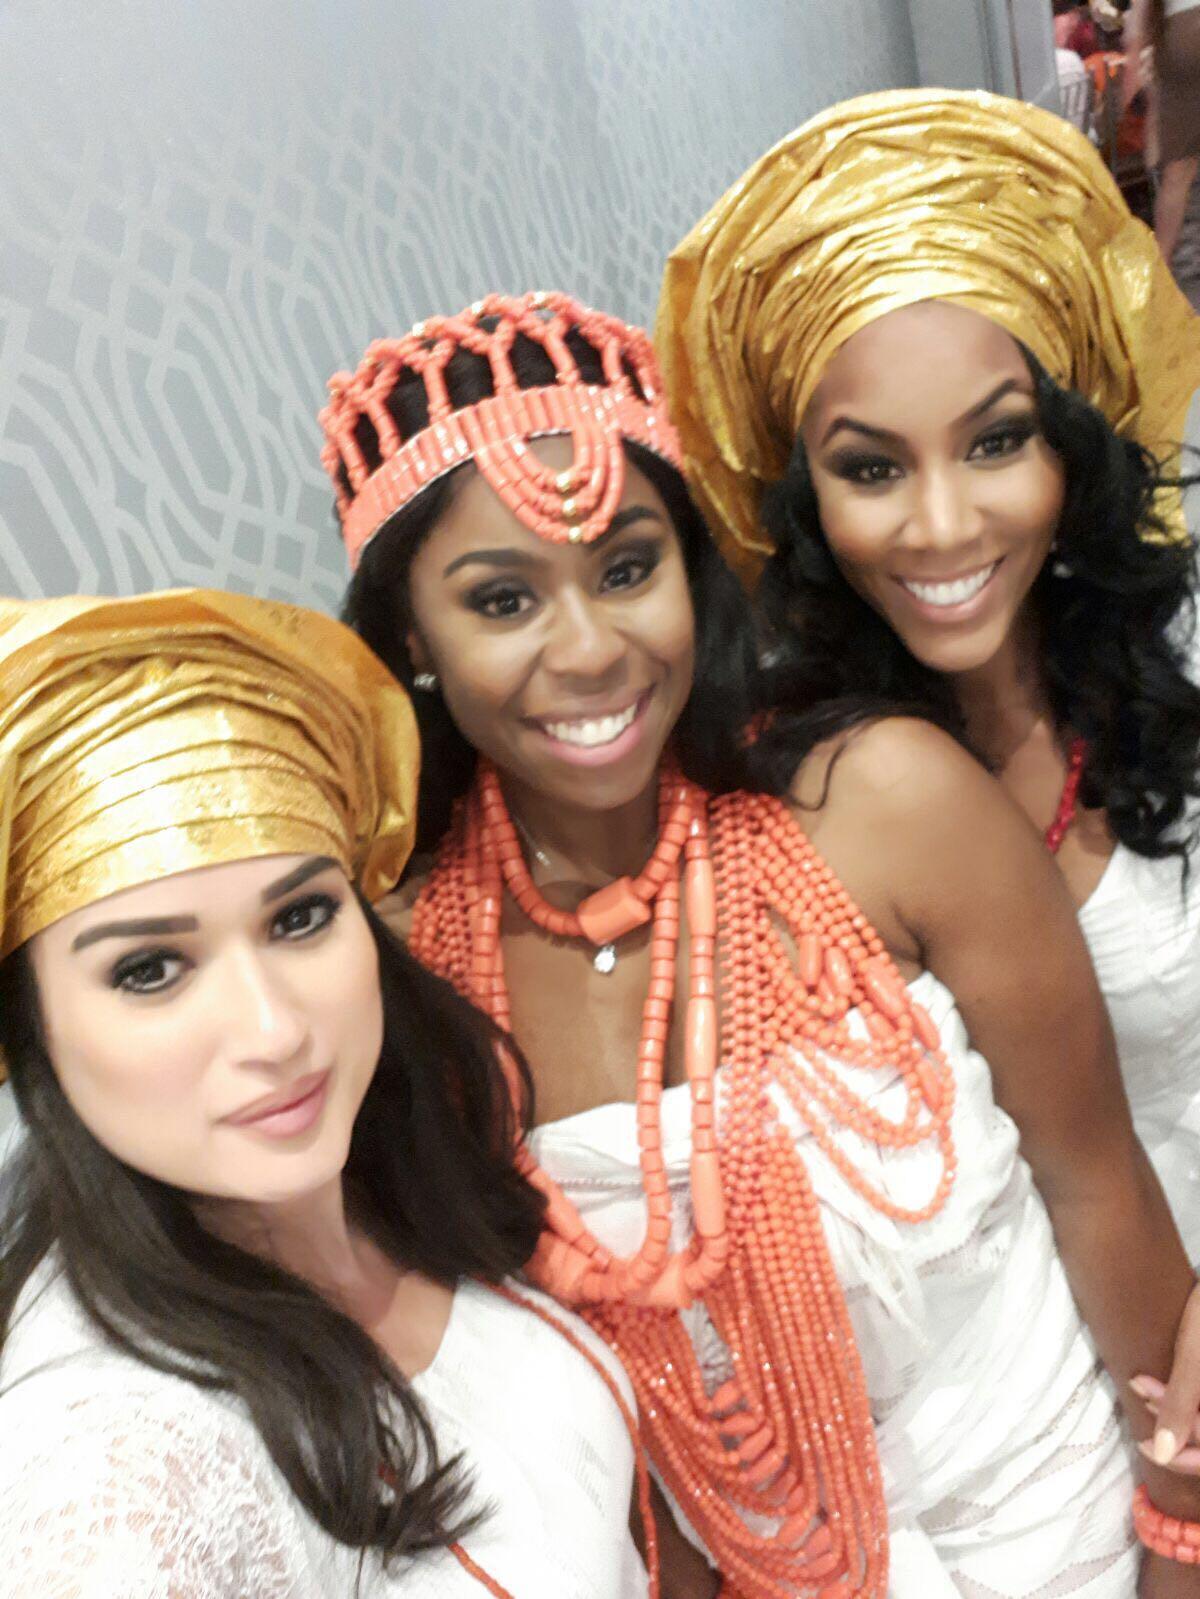 Attending my besties wedding back home, in traditional Nigerian attire :)